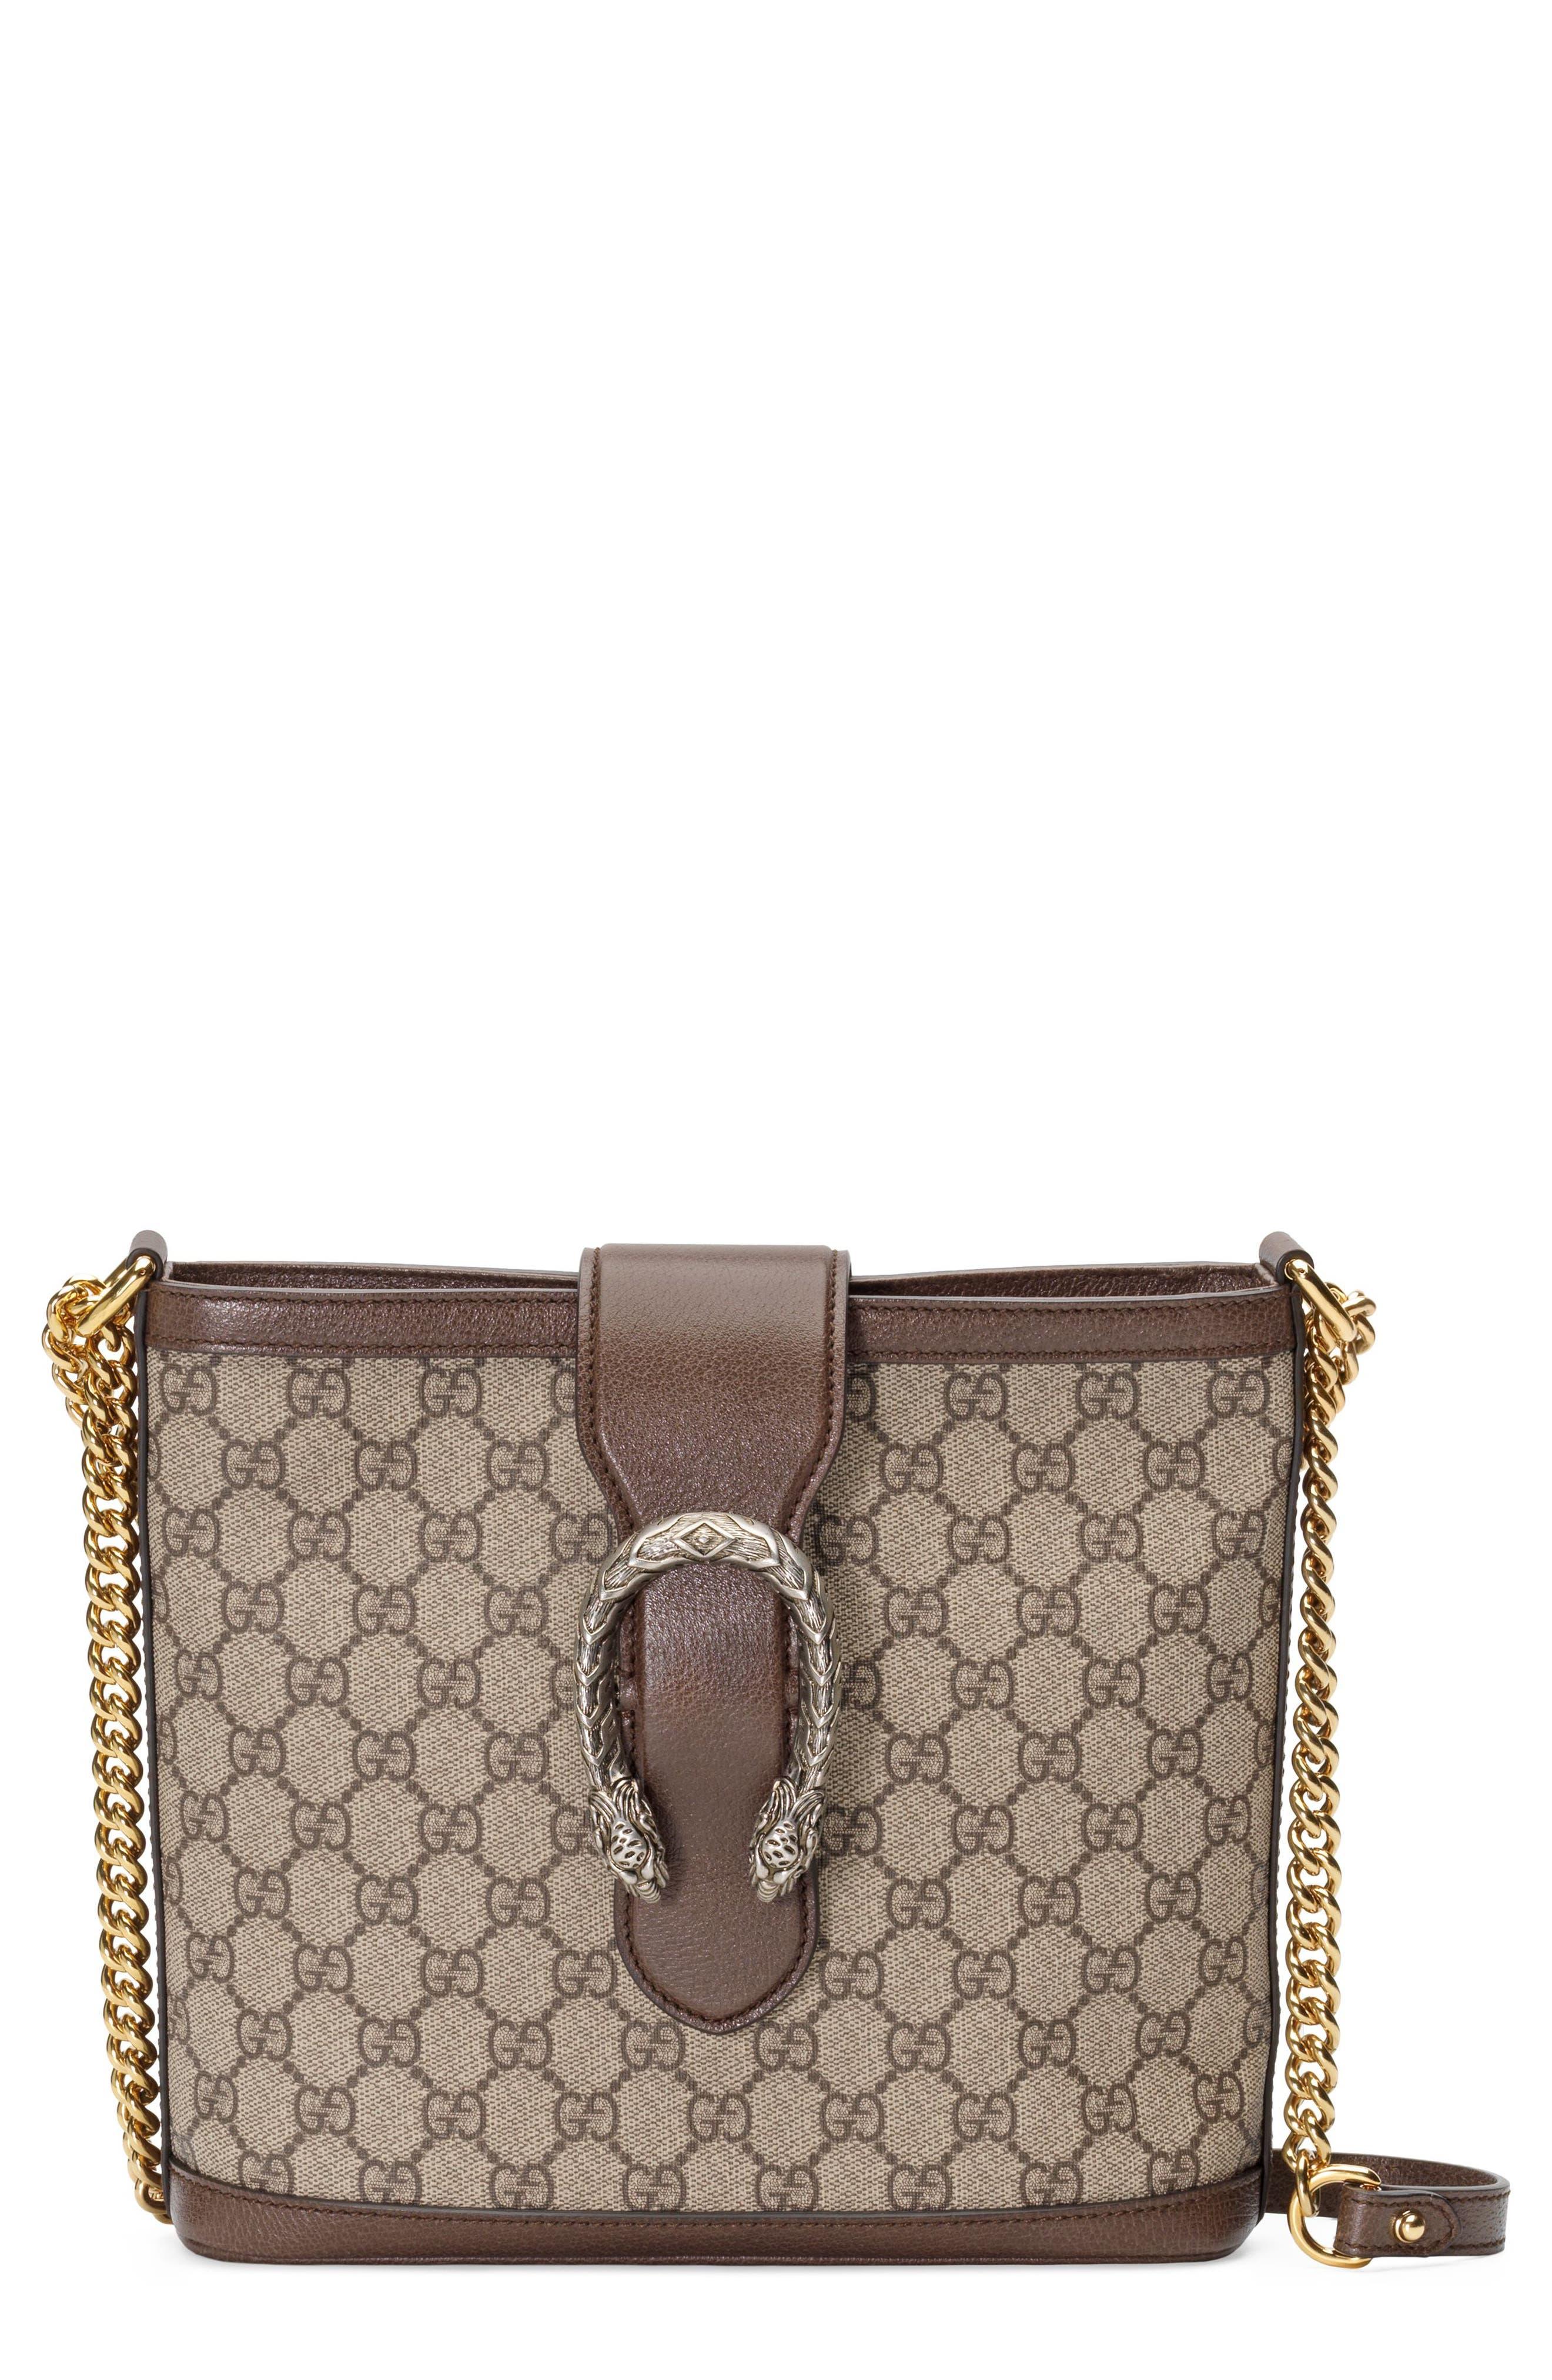 Medium Dionysus Supreme Canvas Shoulder Bag,                         Main,                         color, BEIGE EBONY/ NEW ACERO